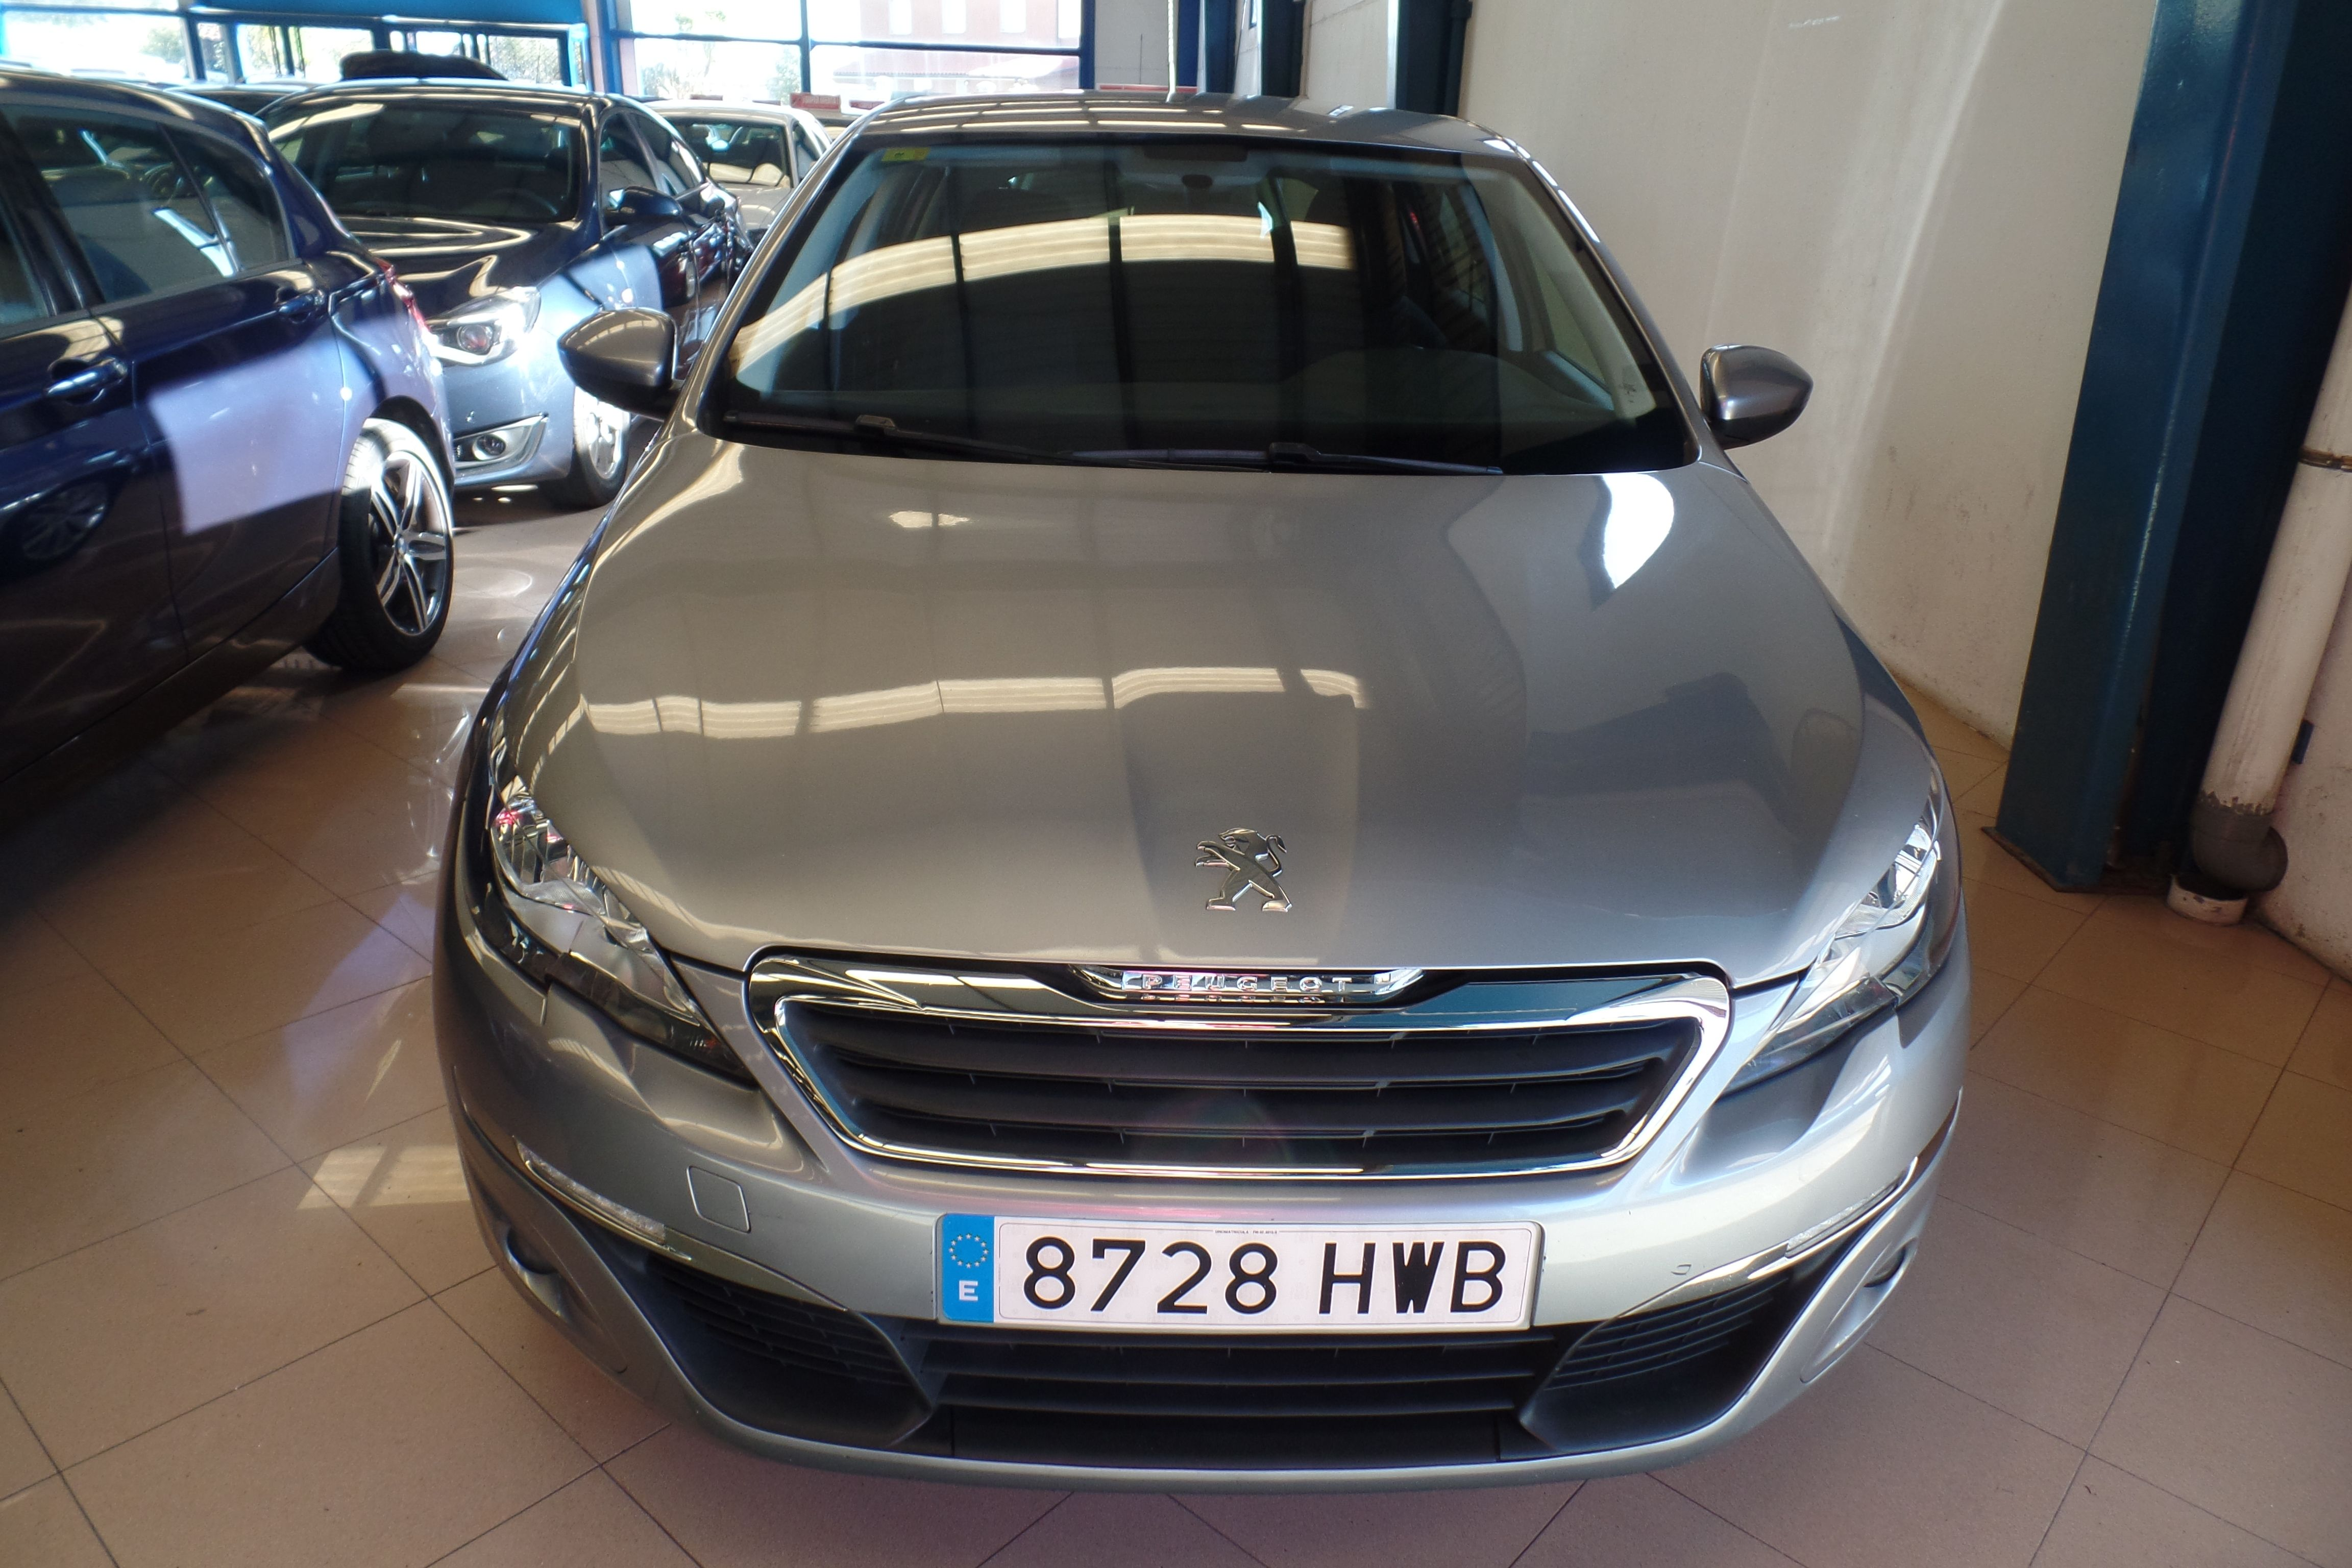 PEUGEOT 308 Nuevo 308 5p Business Line 1.6 eHDi 115 (8728-HWB): Servicios Peugeot de Senra Sport